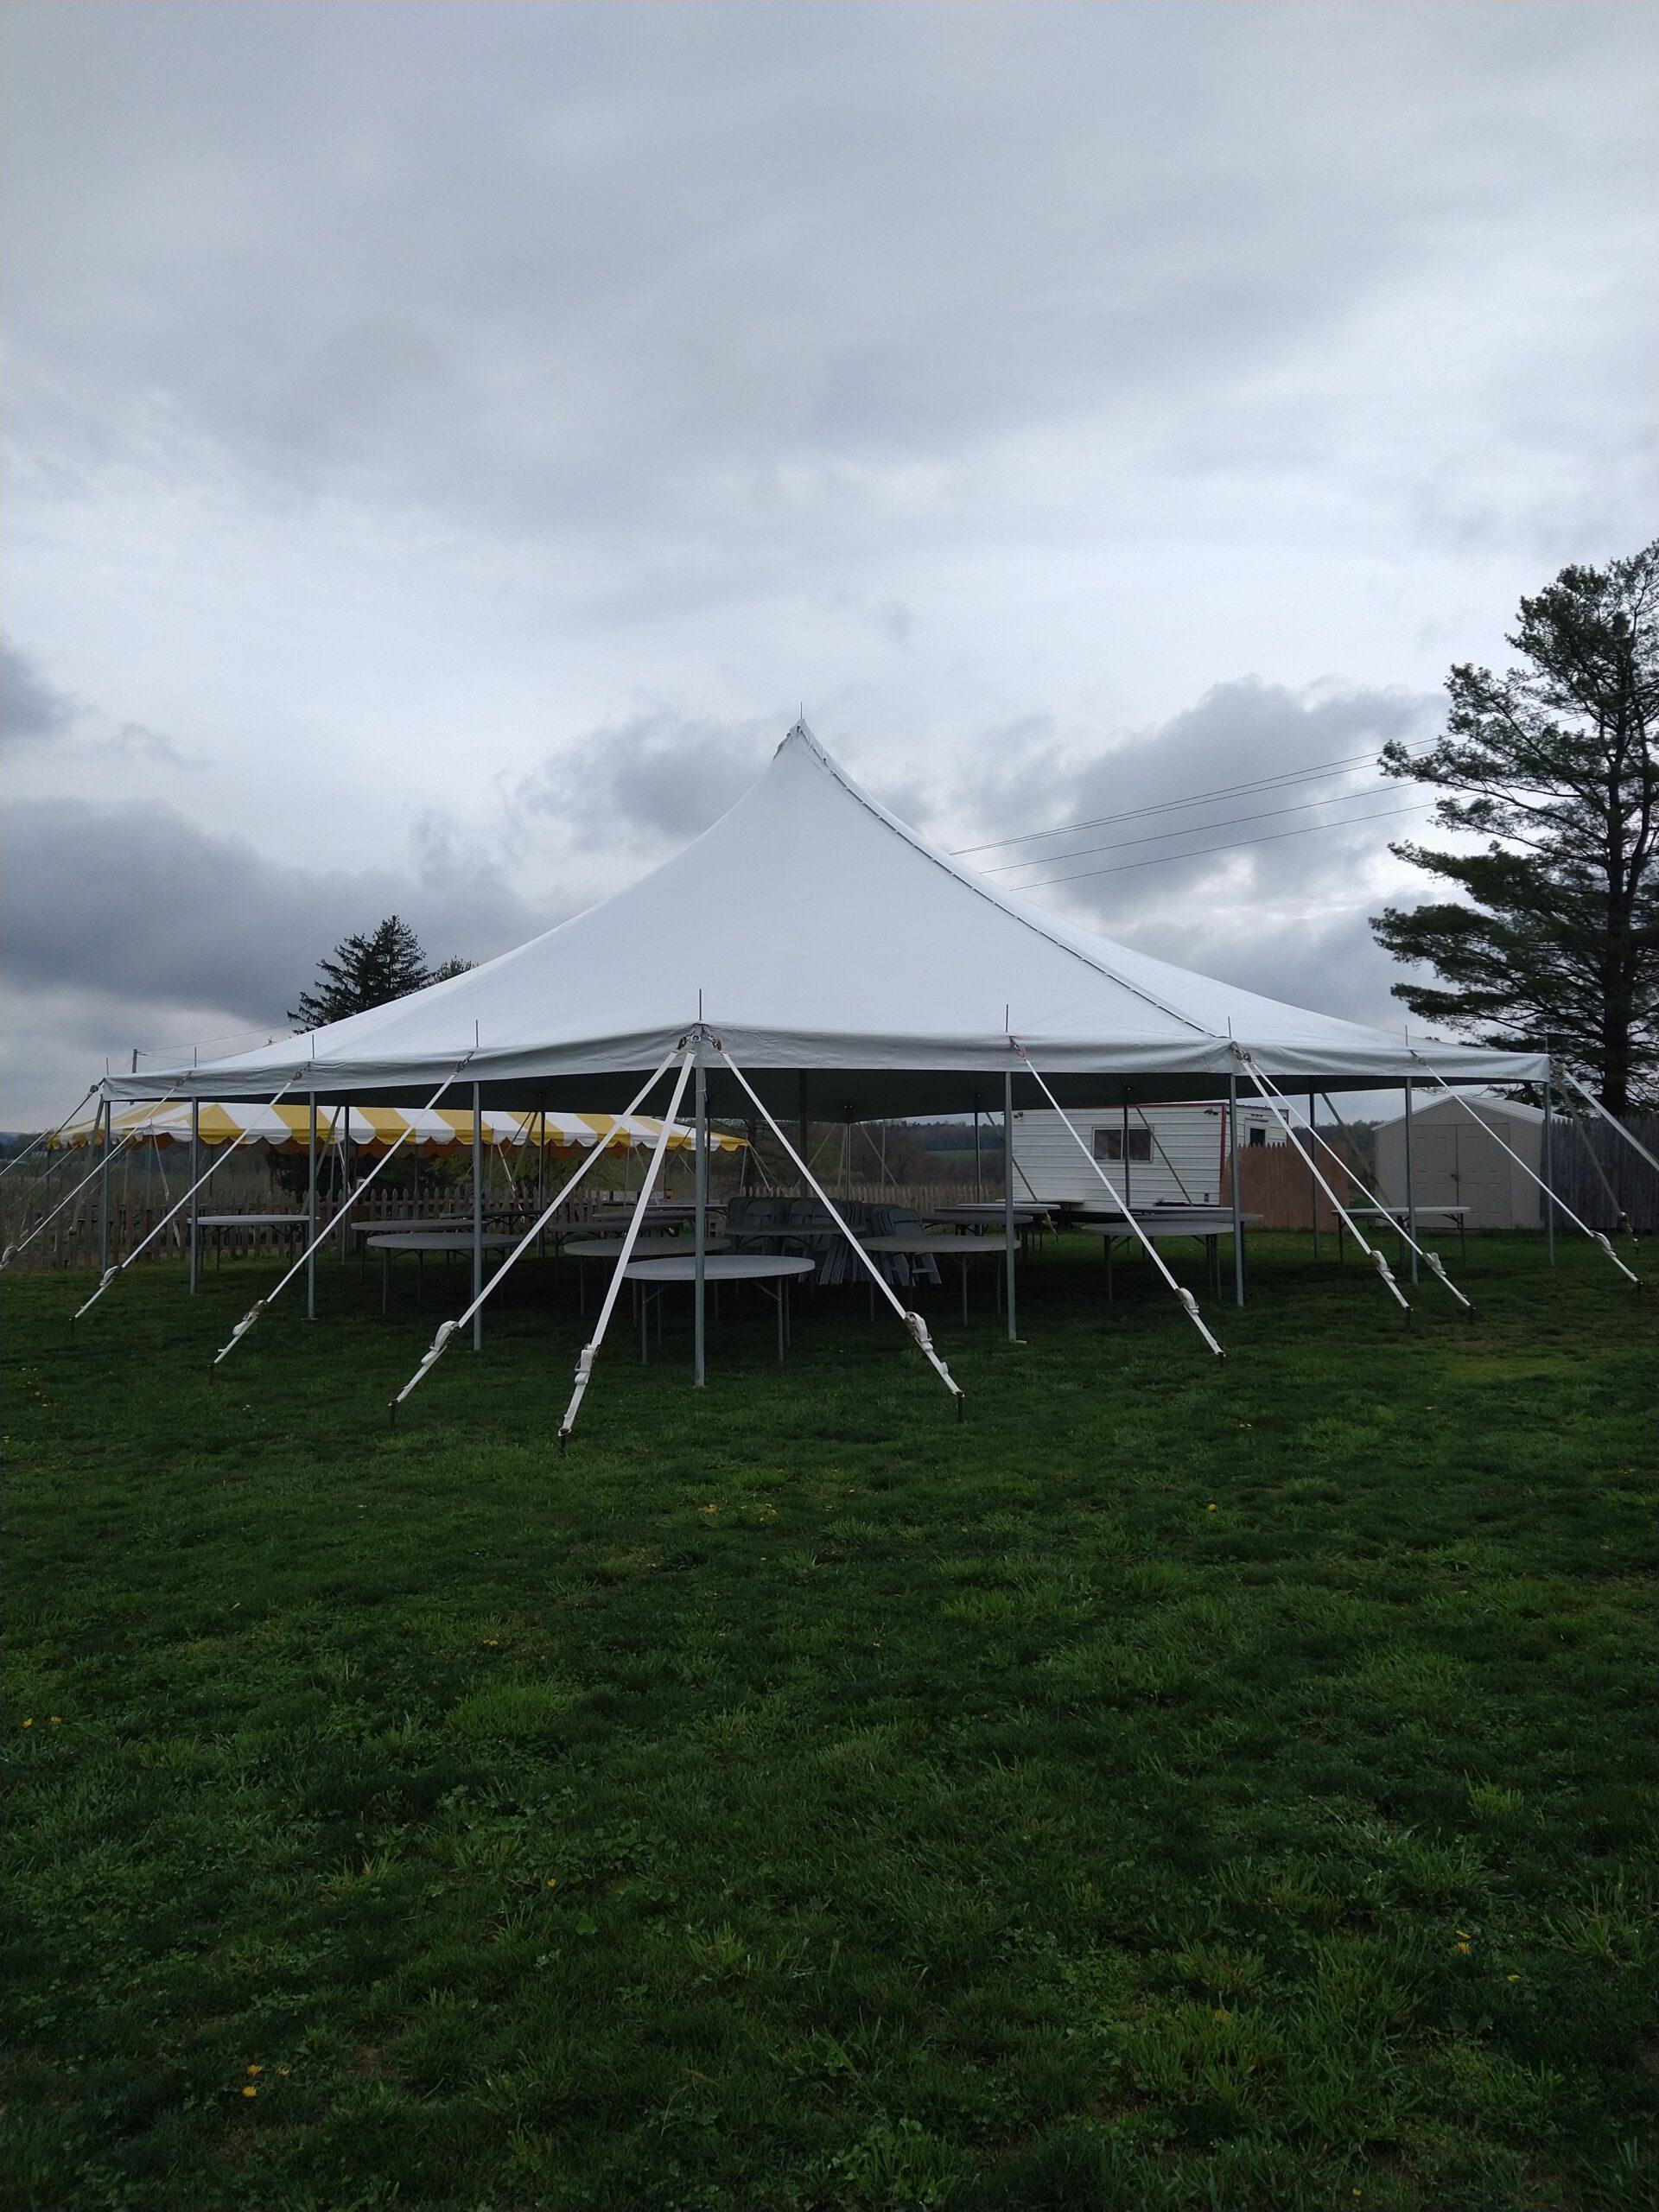 Image of 40x40 Pole Tent Rental